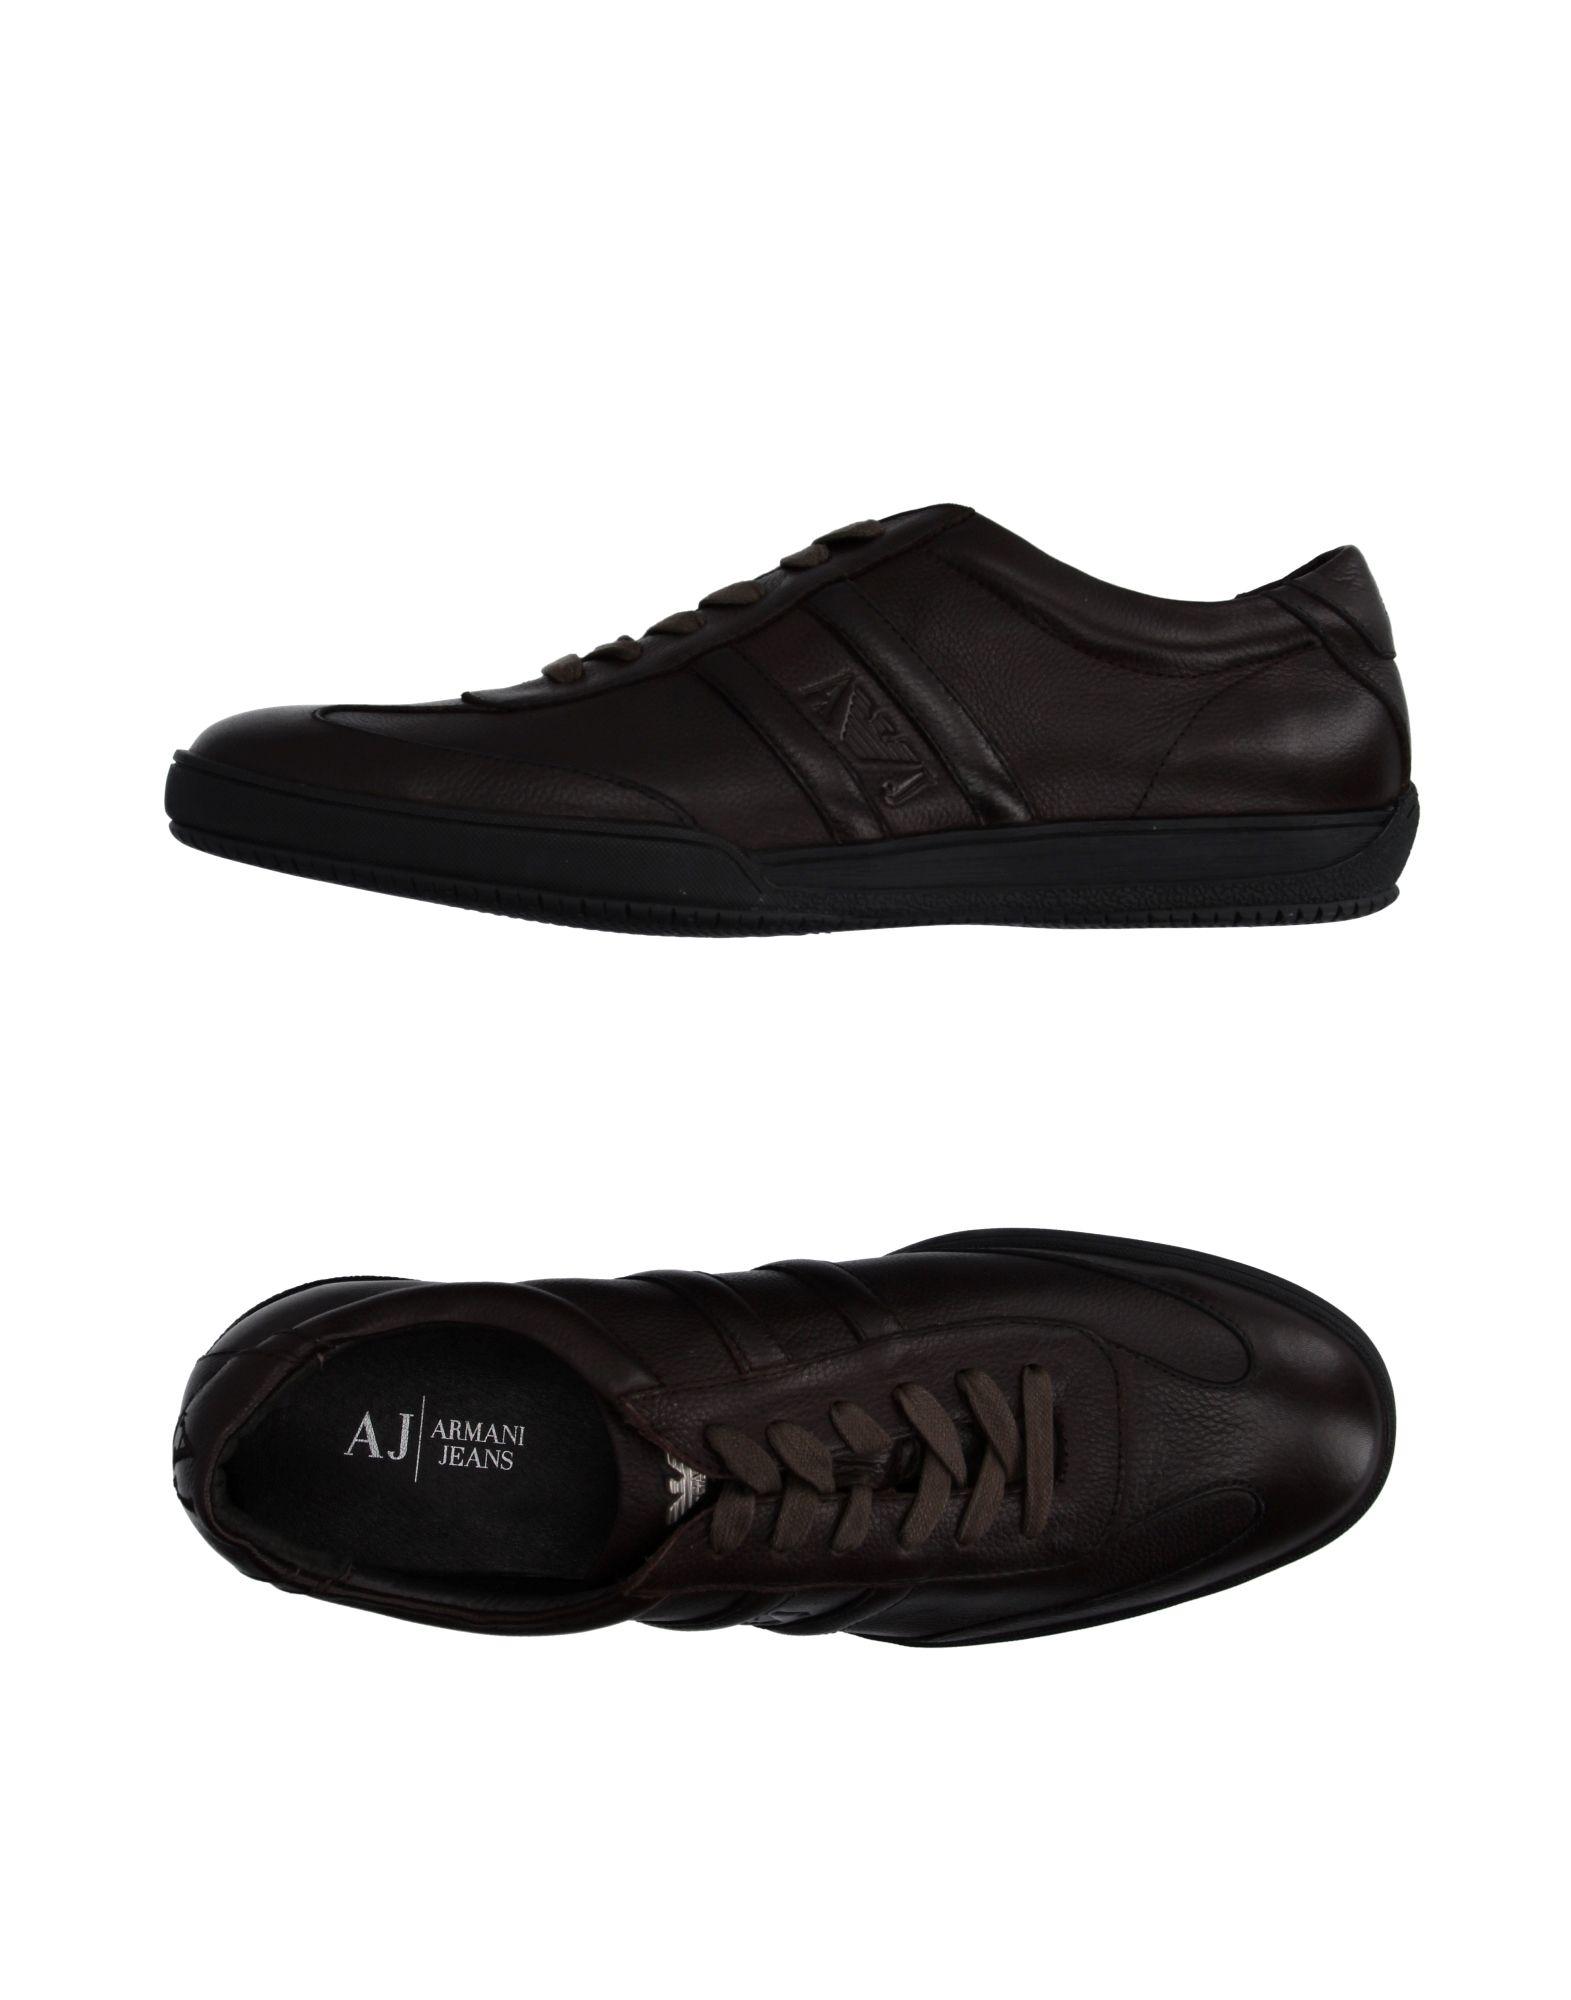 Vente chaussure armani jeans pas cher Gatorade Daim Vert Pas Chers ... 15168d56f8f